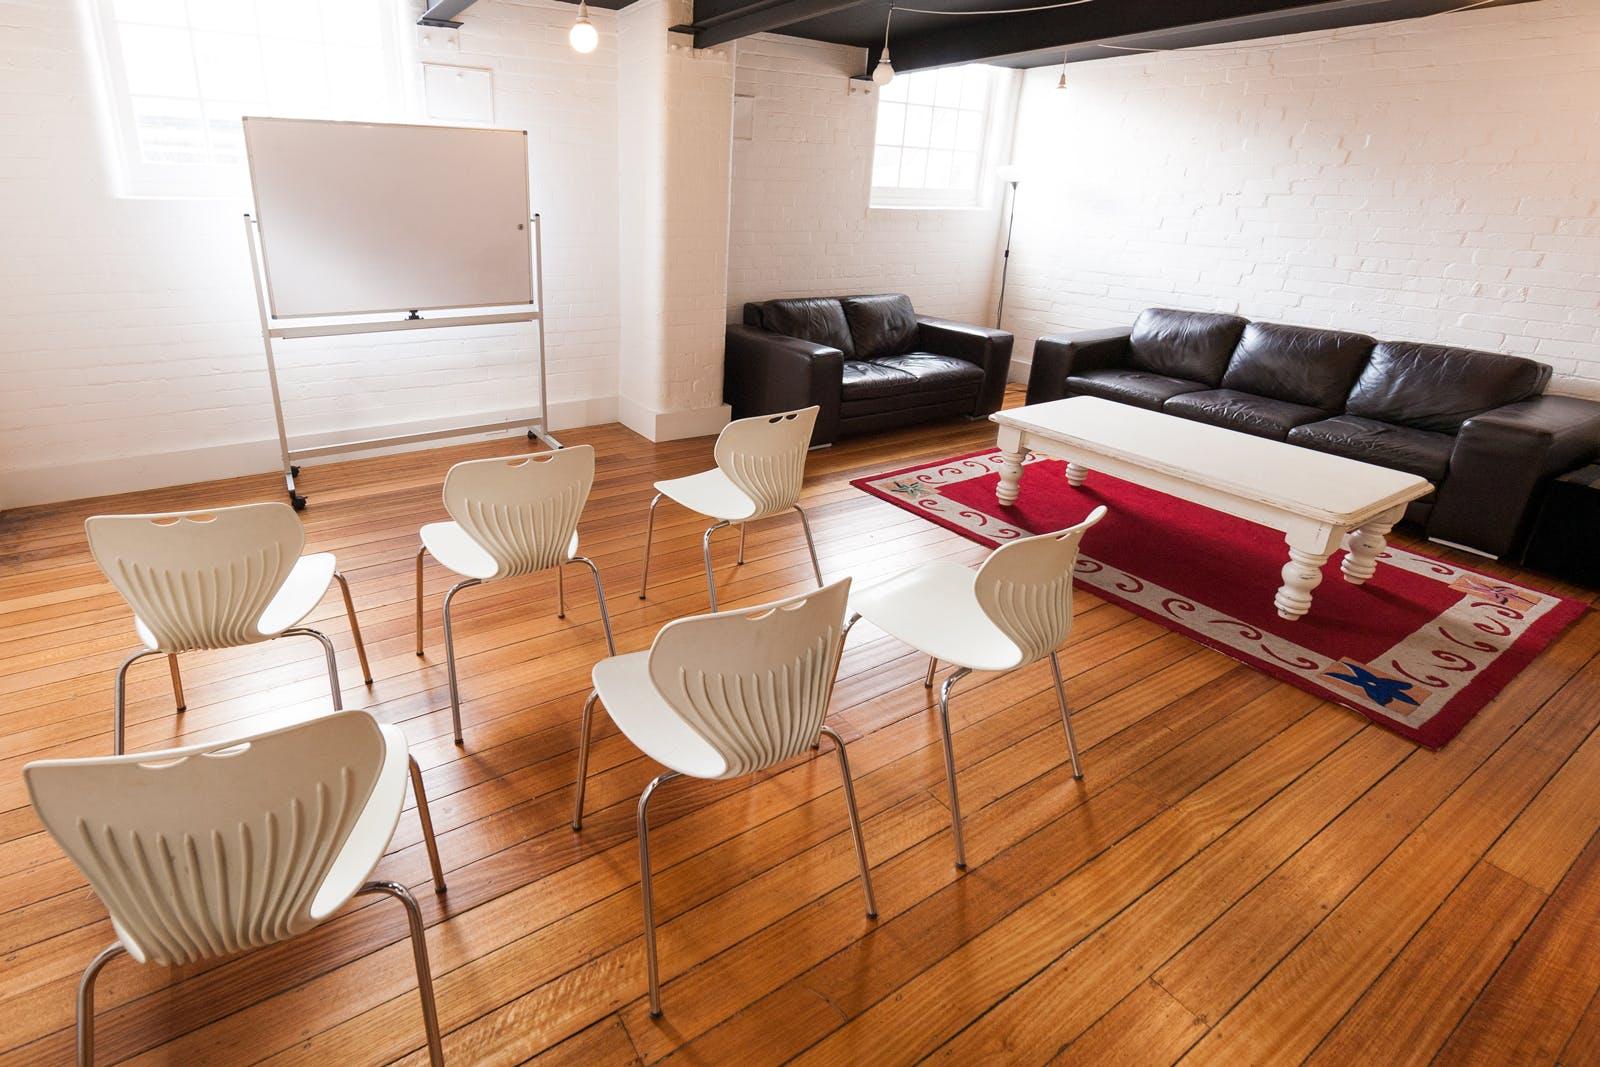 Brunswick Room, meeting room at 75 Reid Street, image 1